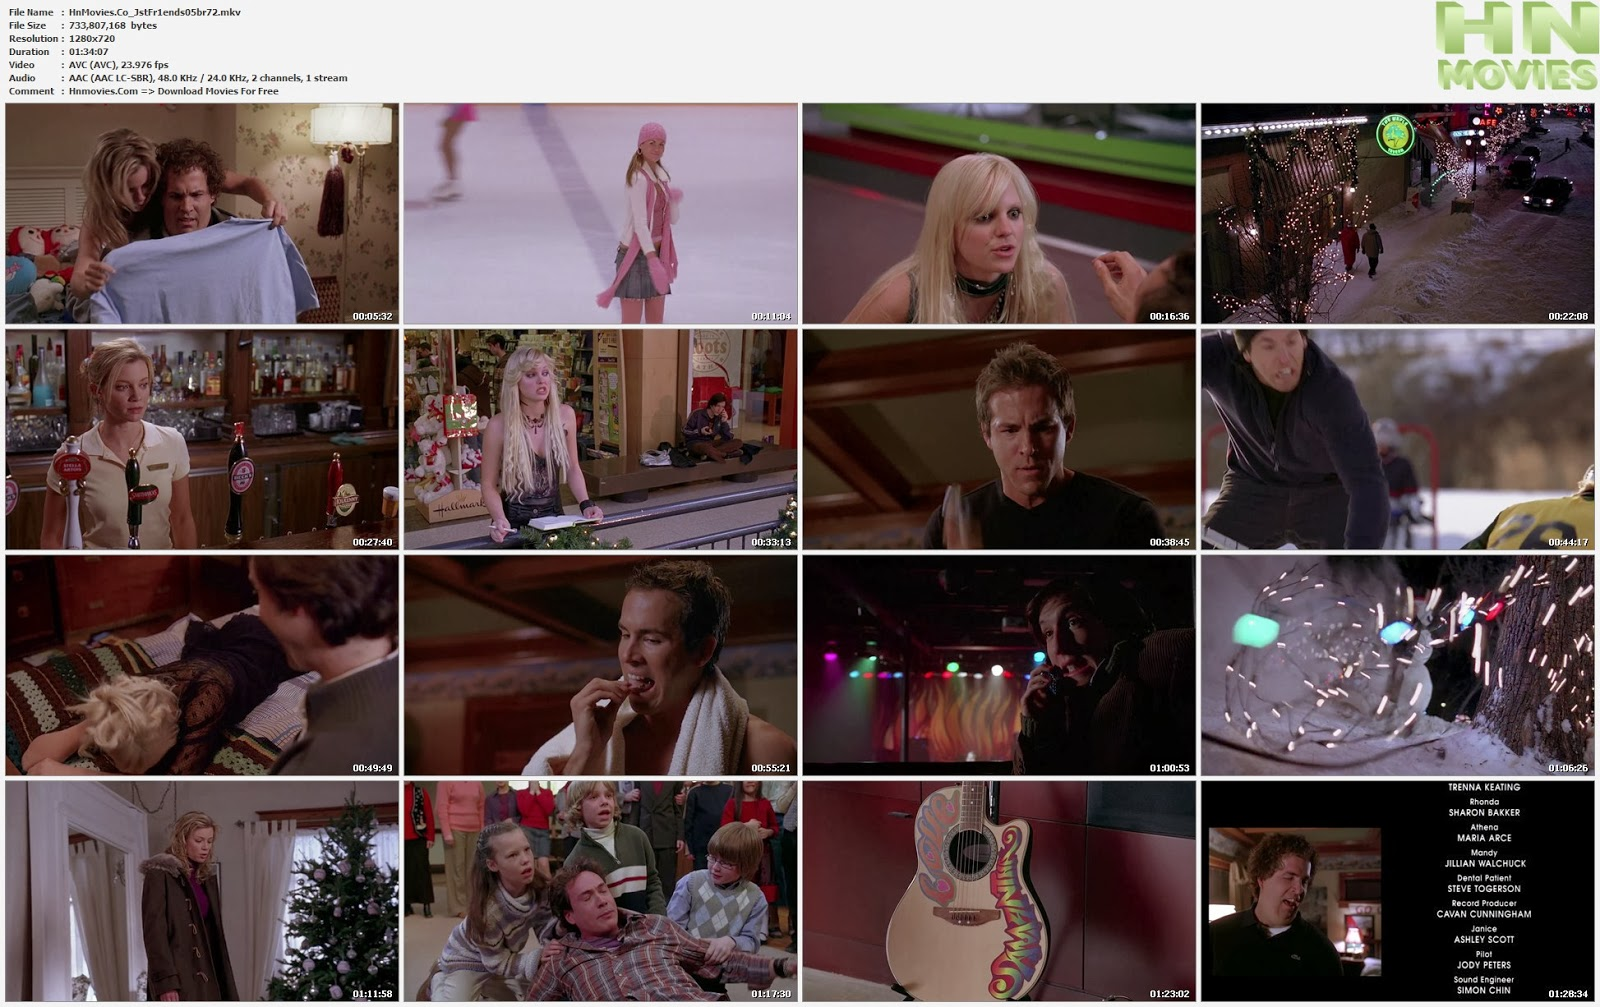 movie screenshot of Just Friends fdmovie.com